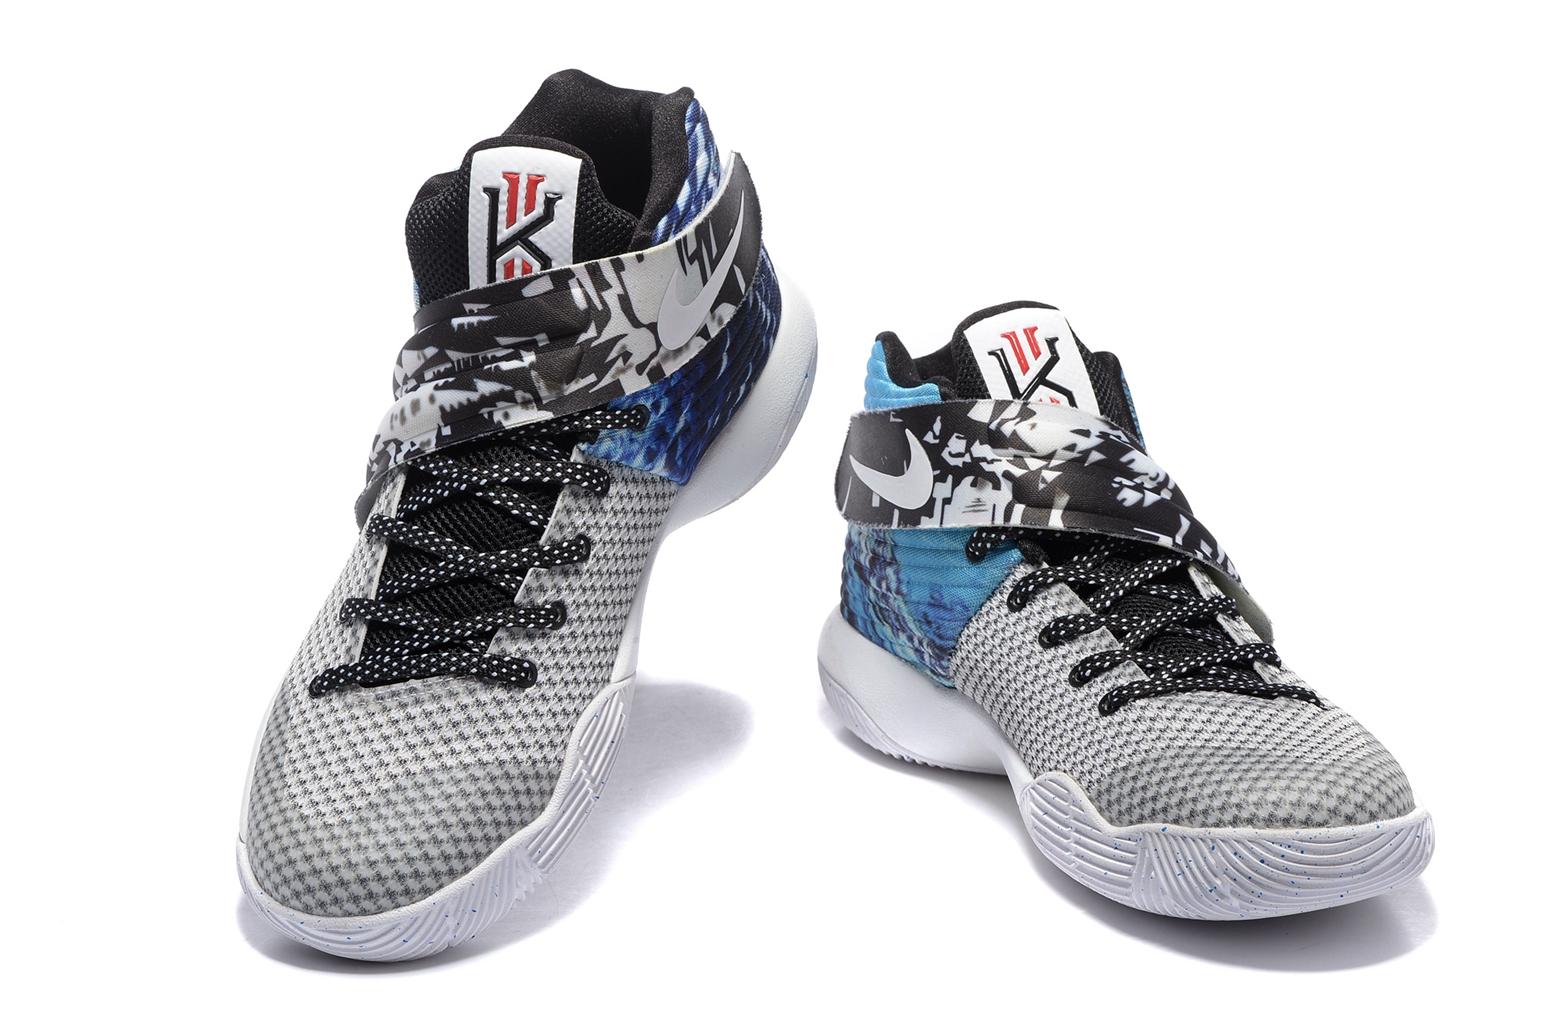 finest selection 86e52 1b5e6 Nike Kyrie II 2 Irving Effect Tie Dye Men Shoes Basketball Sneakers 819583- 901